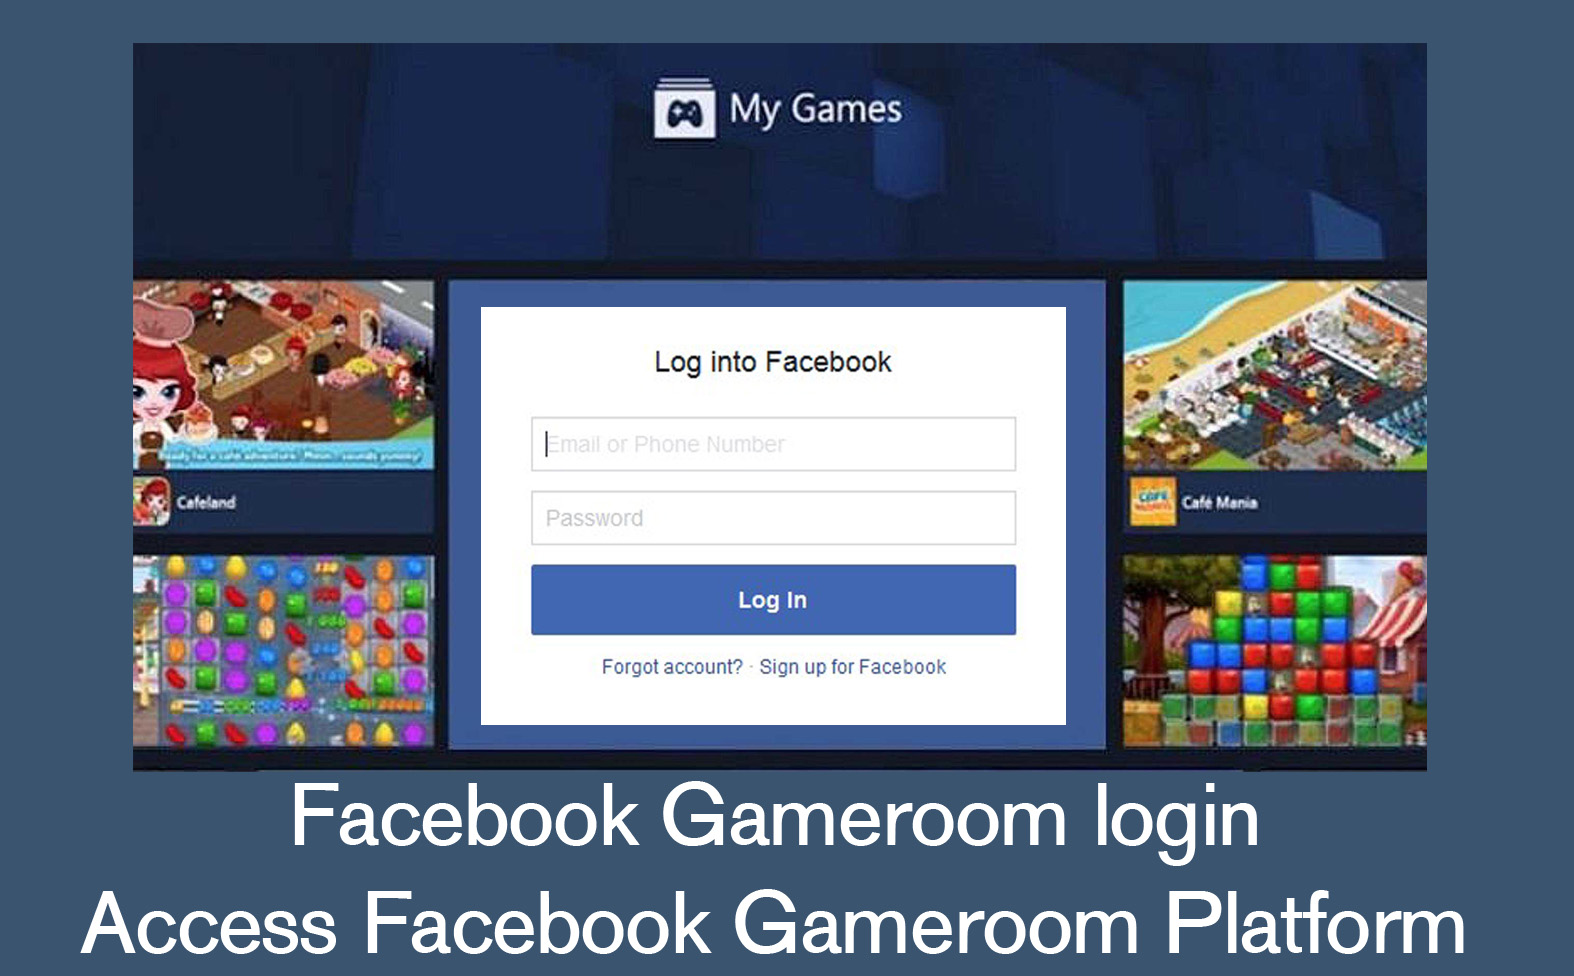 Facebook Gameroom login - Access Facebook Gameroom